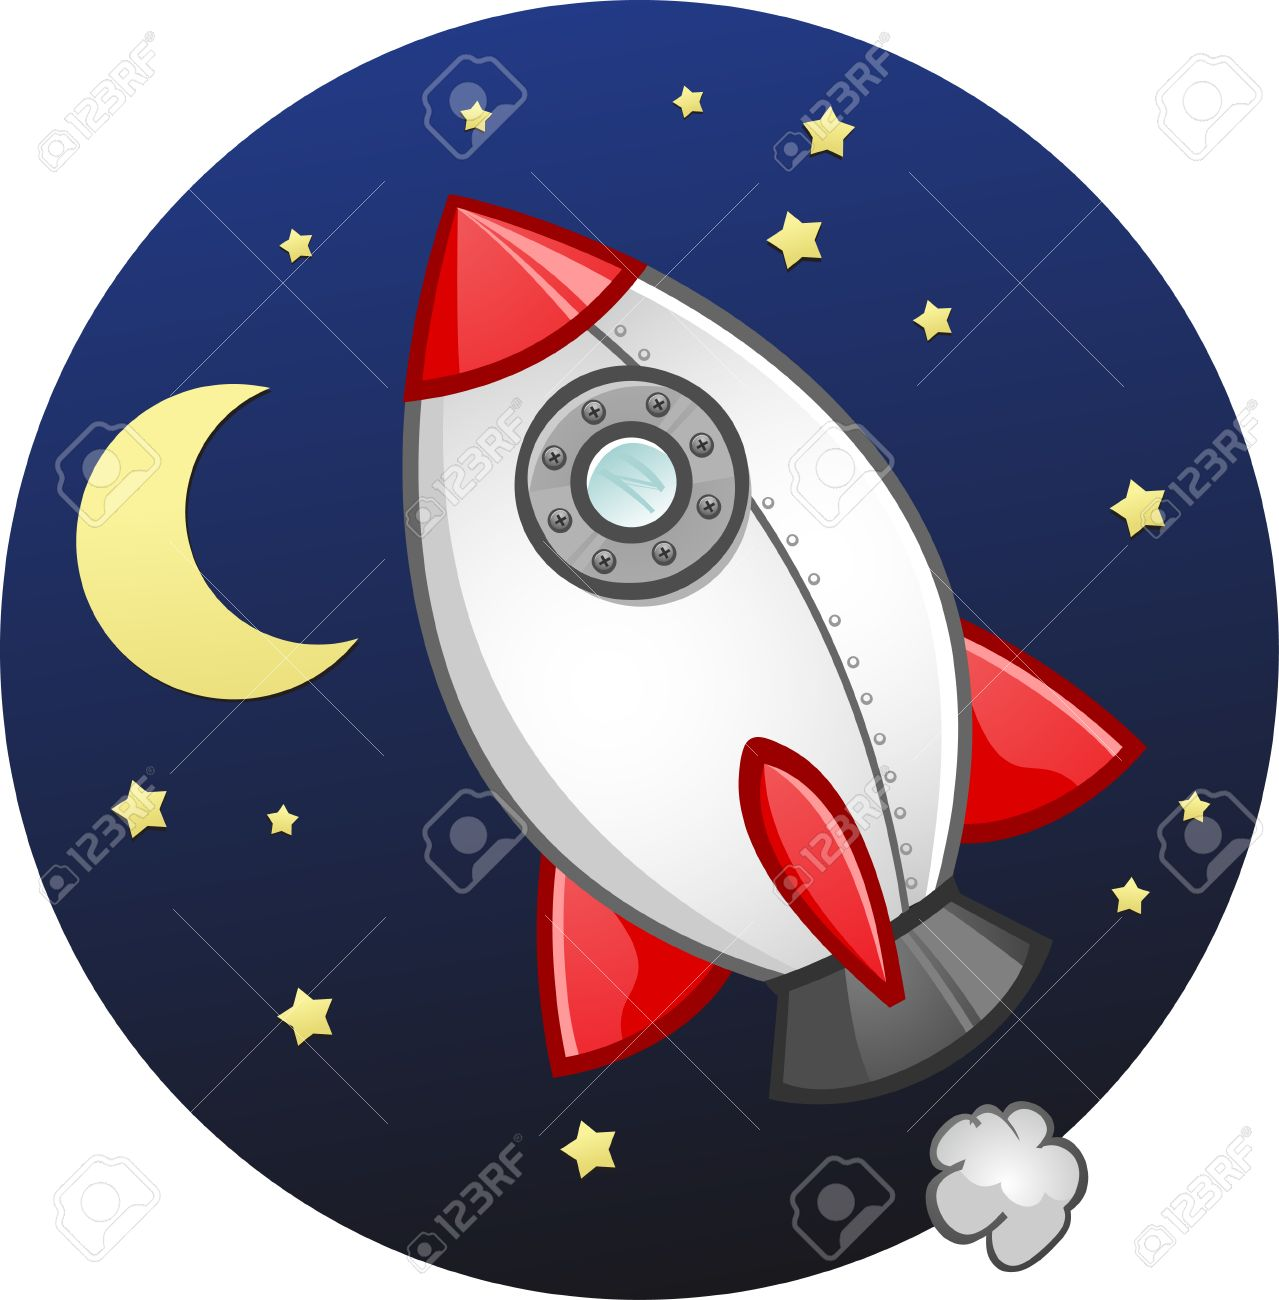 toy rocket ship cartoon royalty free cliparts vectors and stock rh 123rf com rocket ship cartoon video rocket ship cartoon drawing